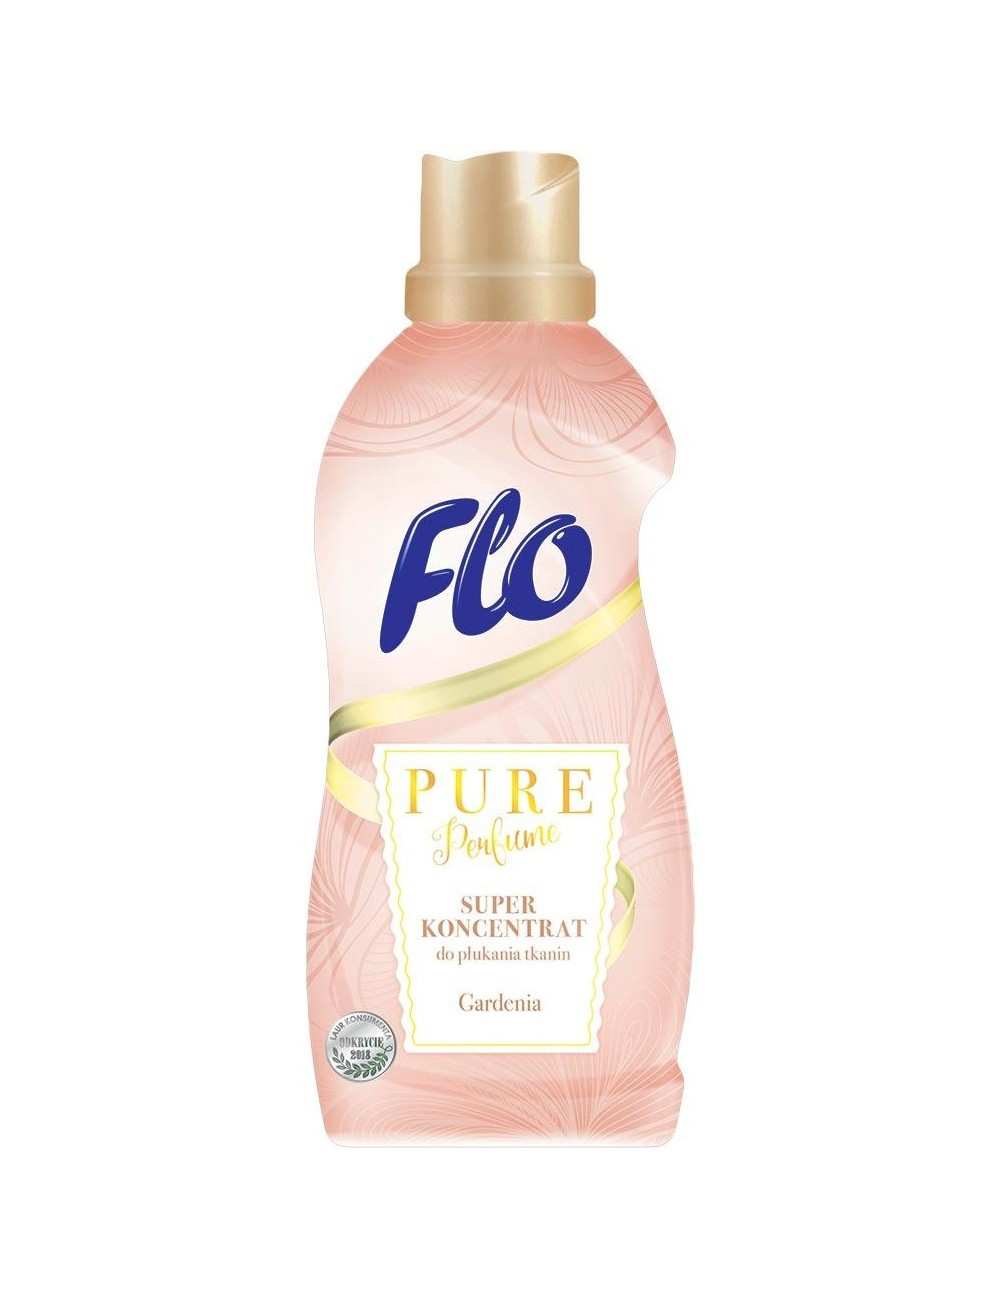 Flo Pure Perfume Gardenia Skoncentrowany Płyn do Płukania Tkanin 1 L